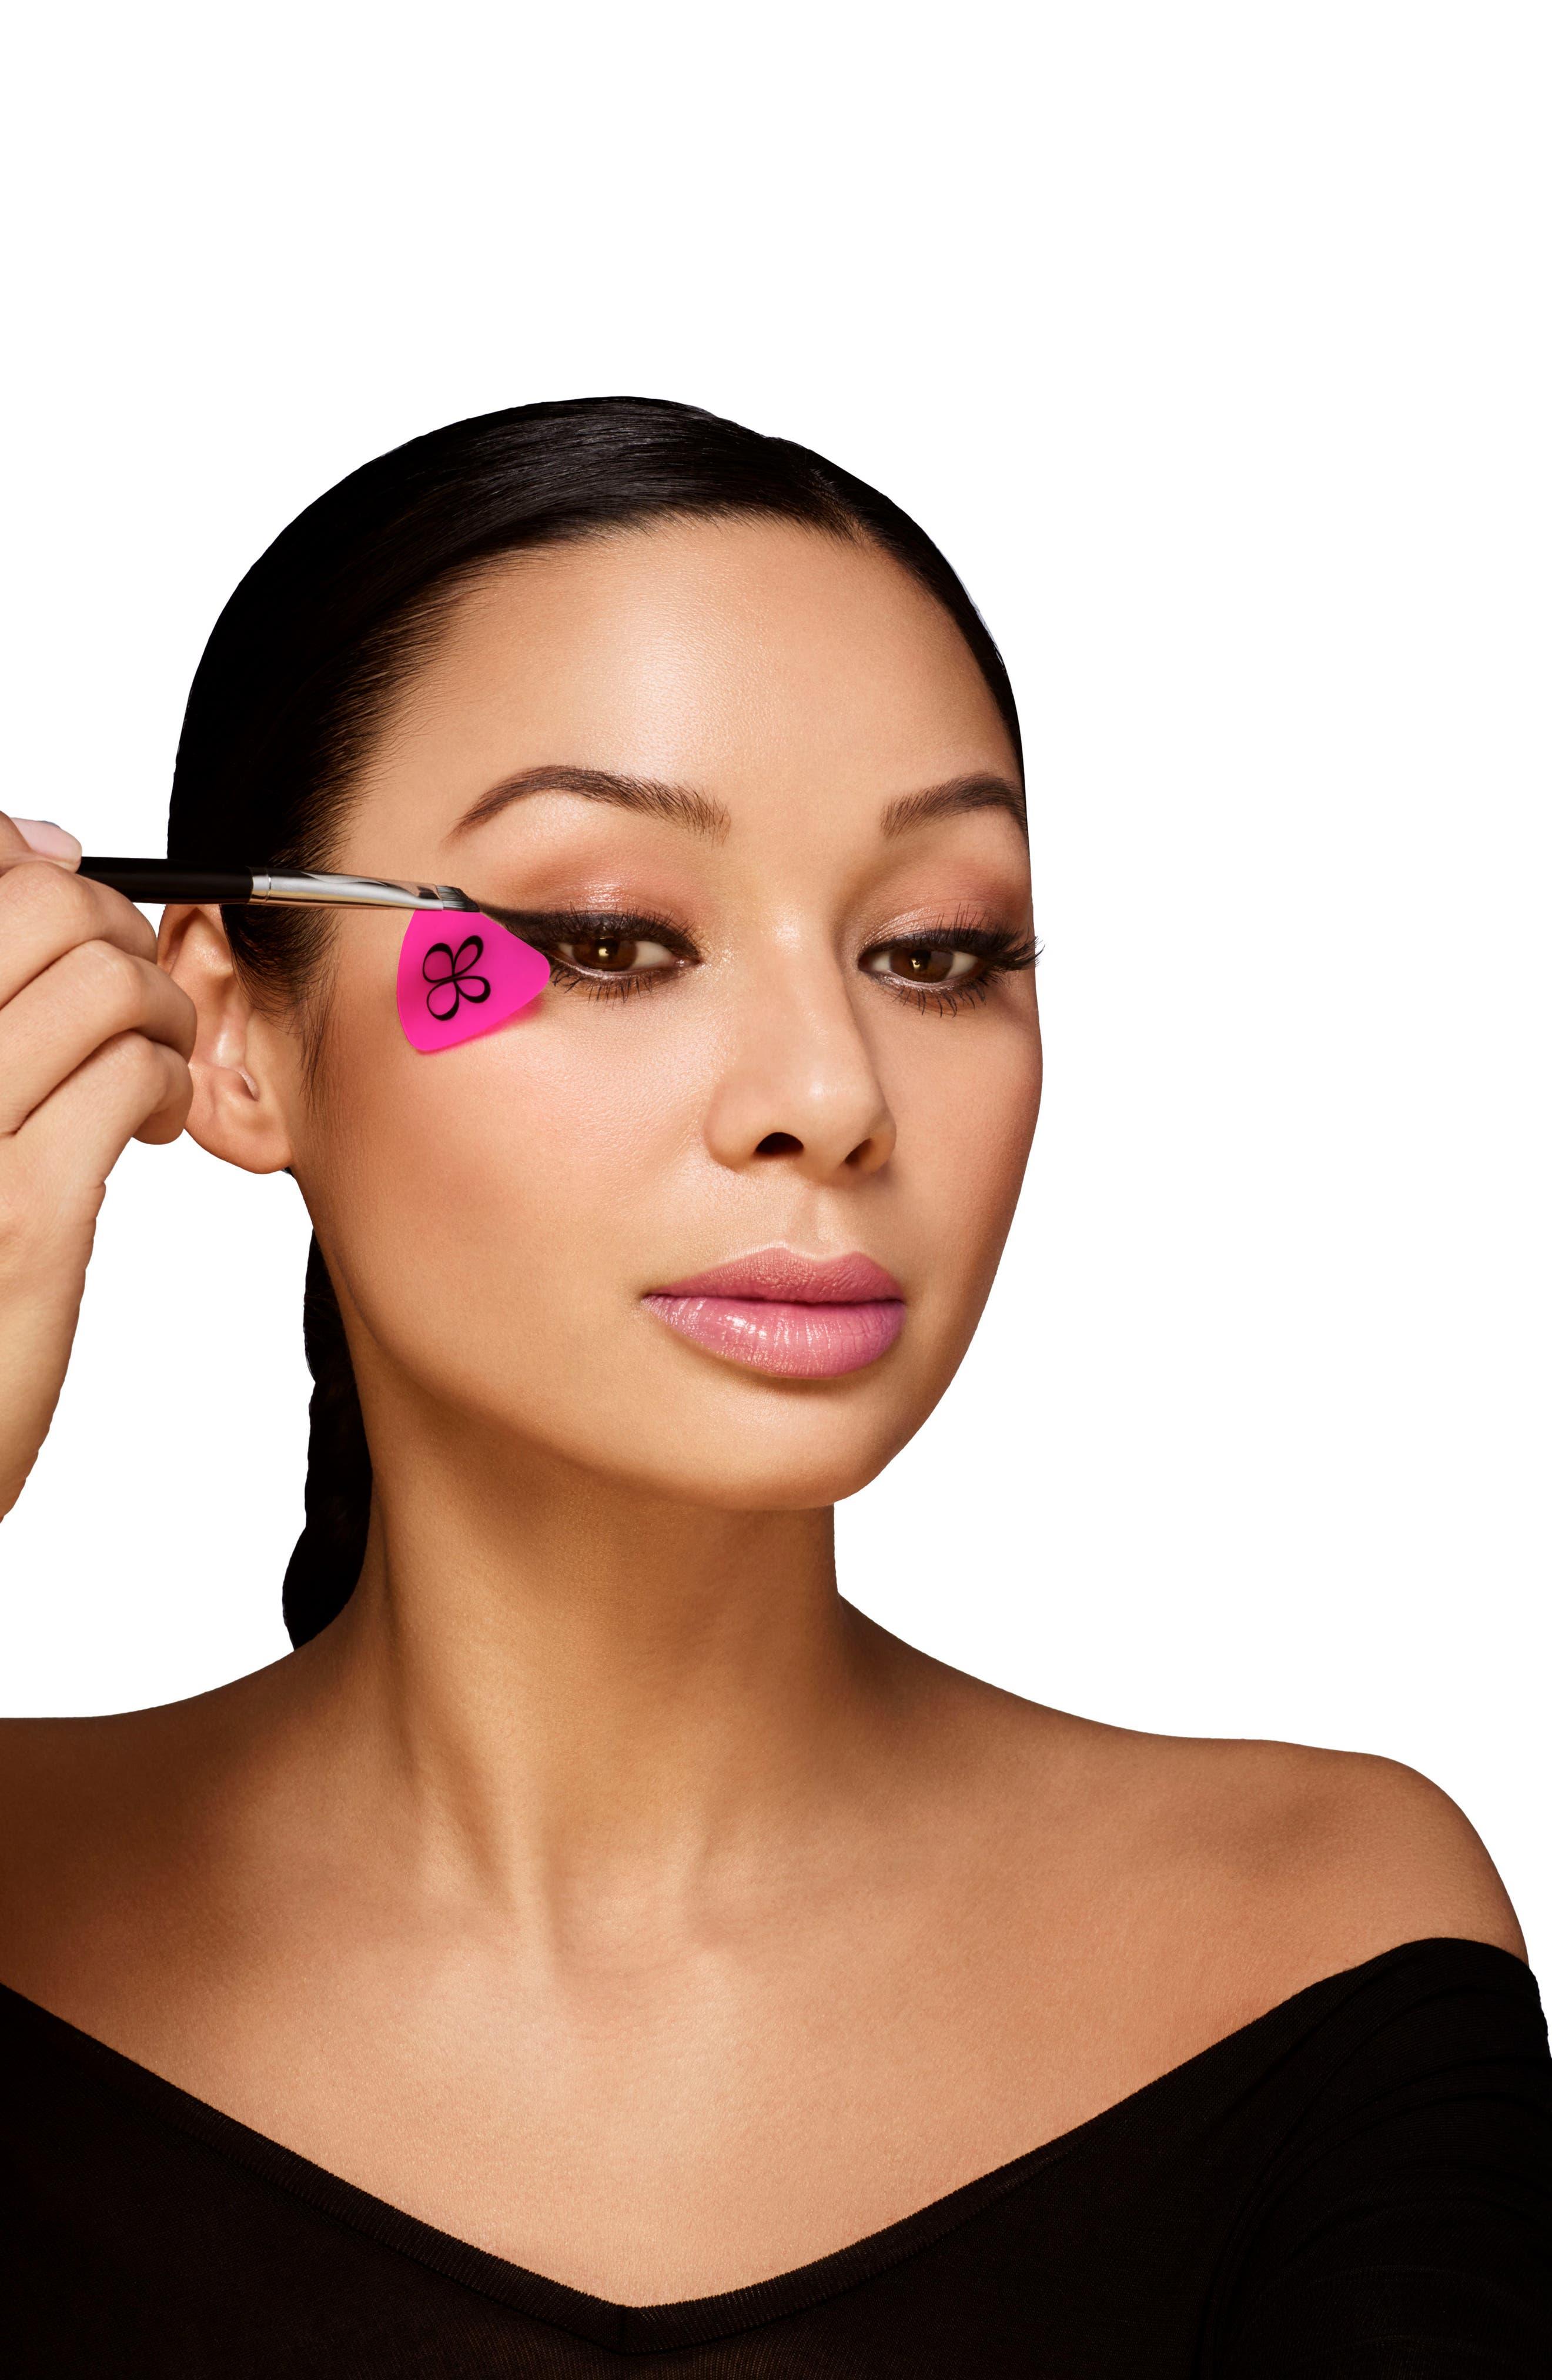 'liner.designer' Eyeliner Application Tool & Compact,                             Alternate thumbnail 8, color,                             NO COLOR